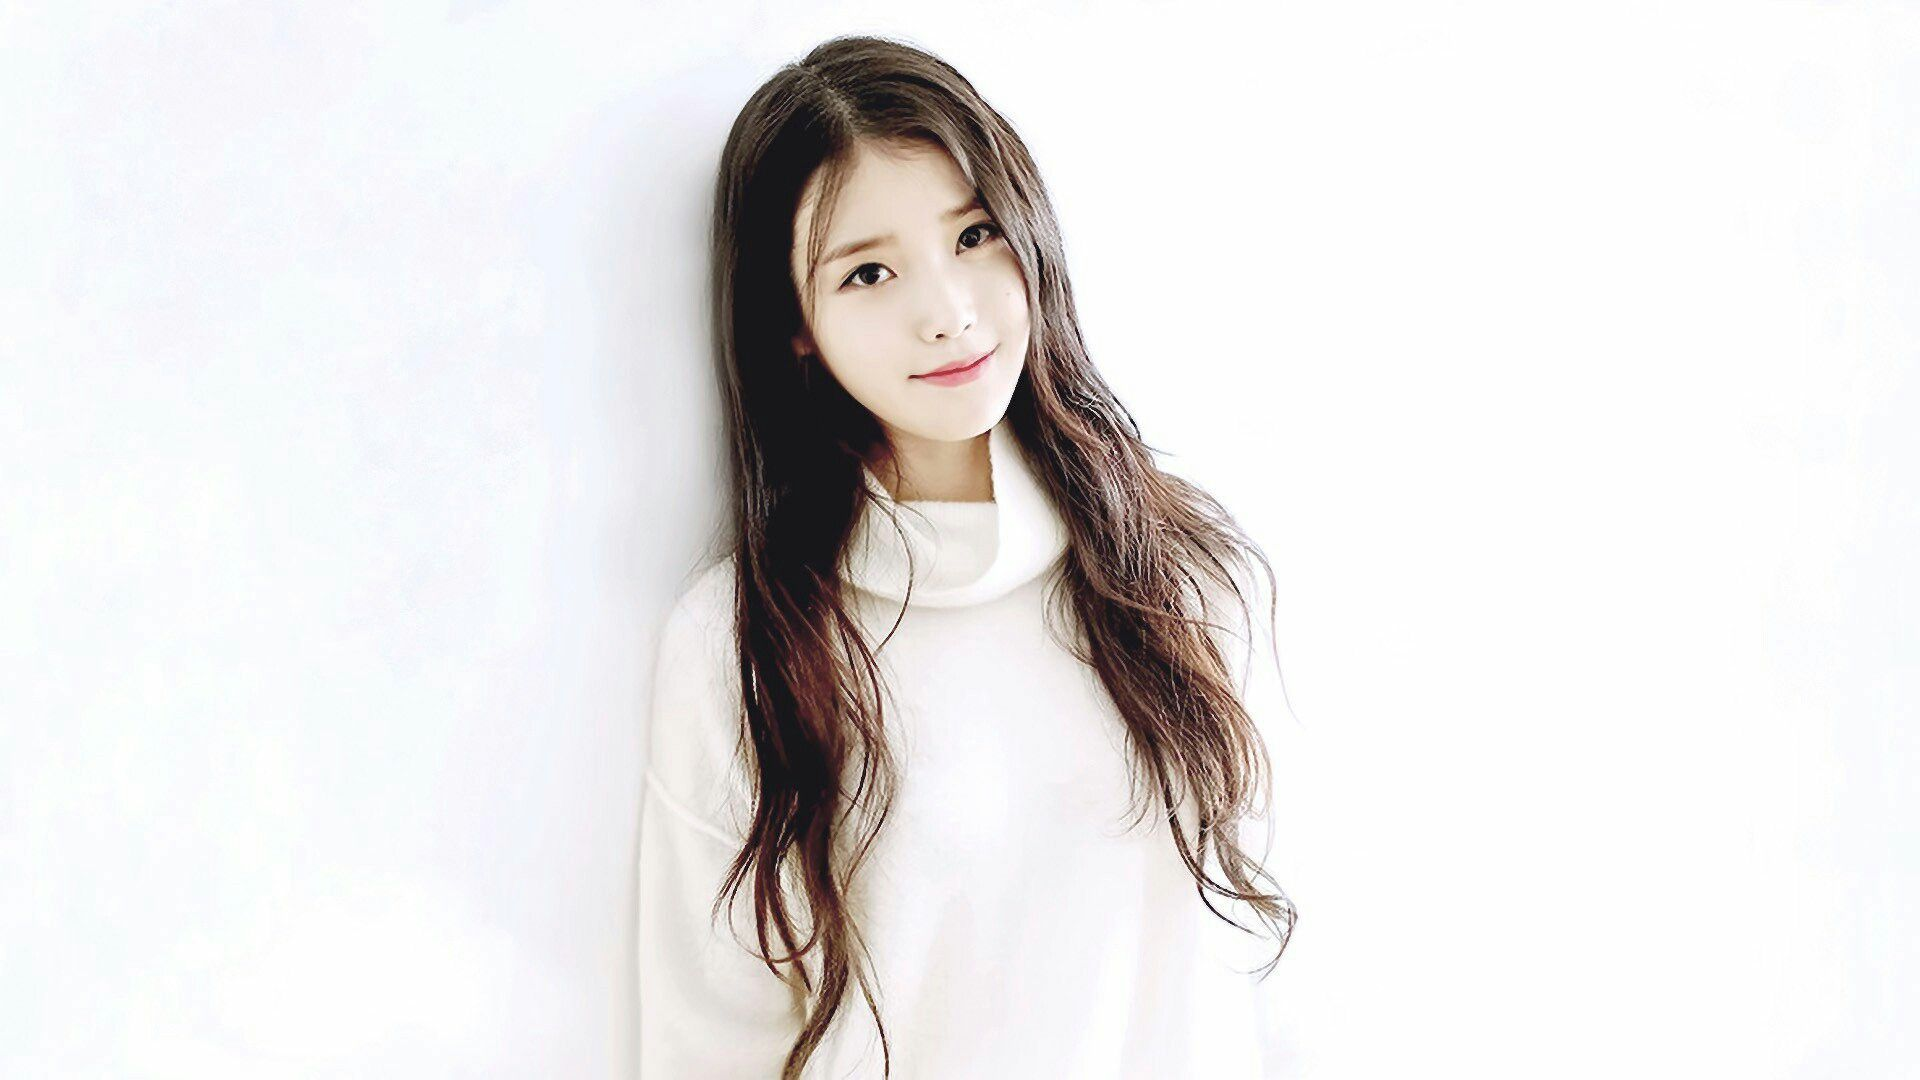 Pin by 허루한 on Asian drama Celebrities, Beautiful